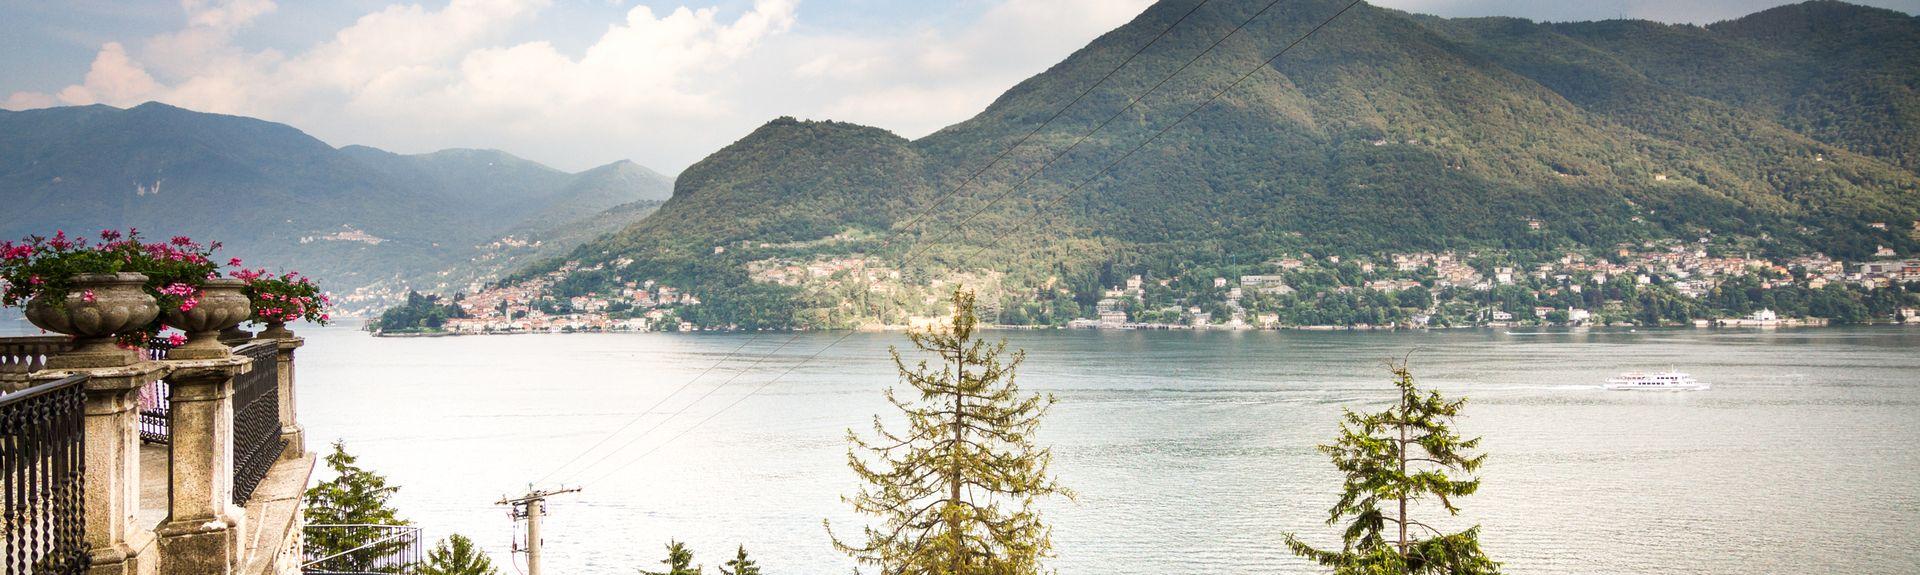 Pognana Lario, Lombardei, Italien